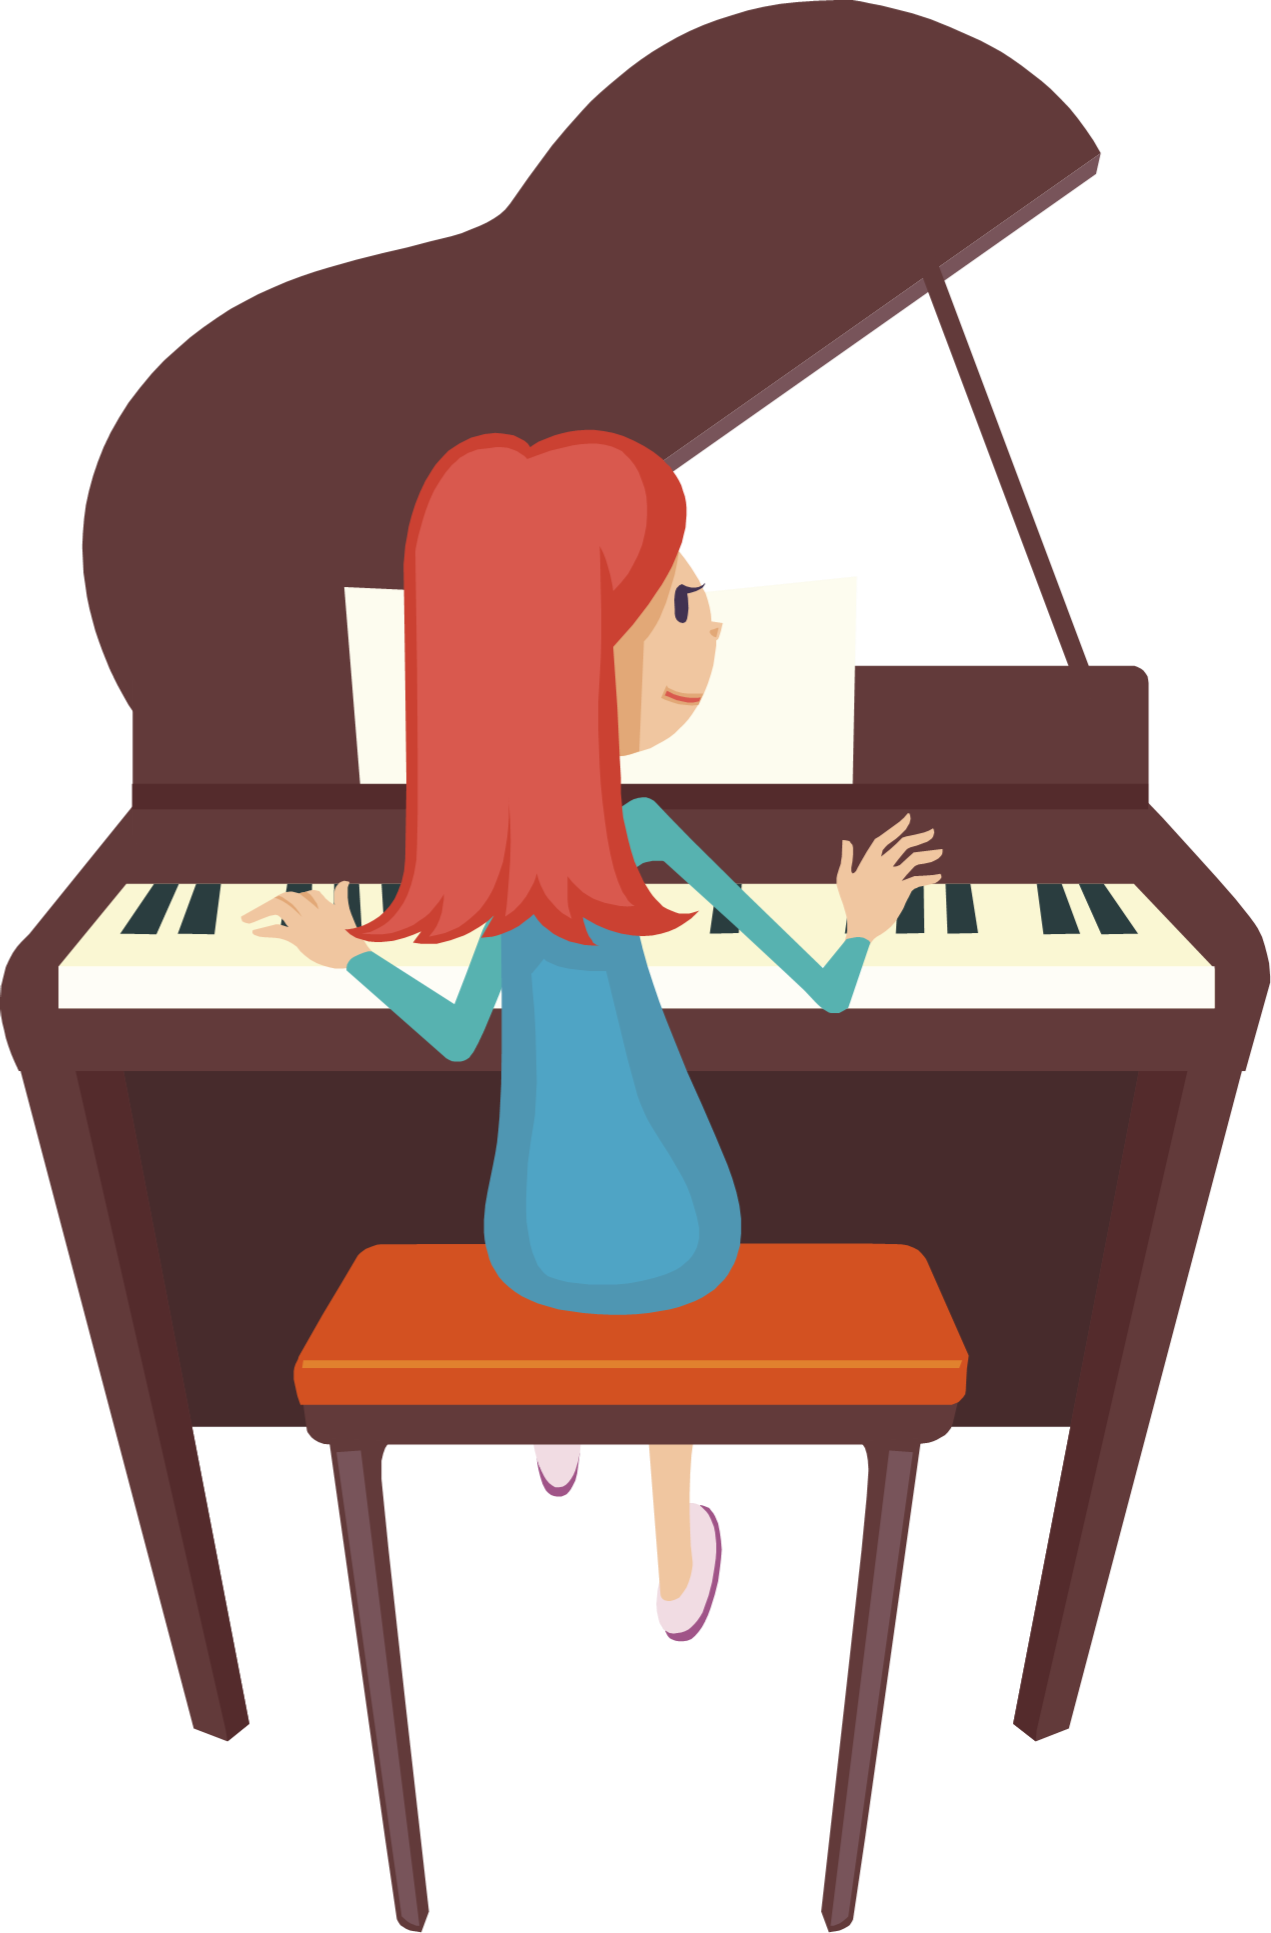 music lessons clip art - photo #10